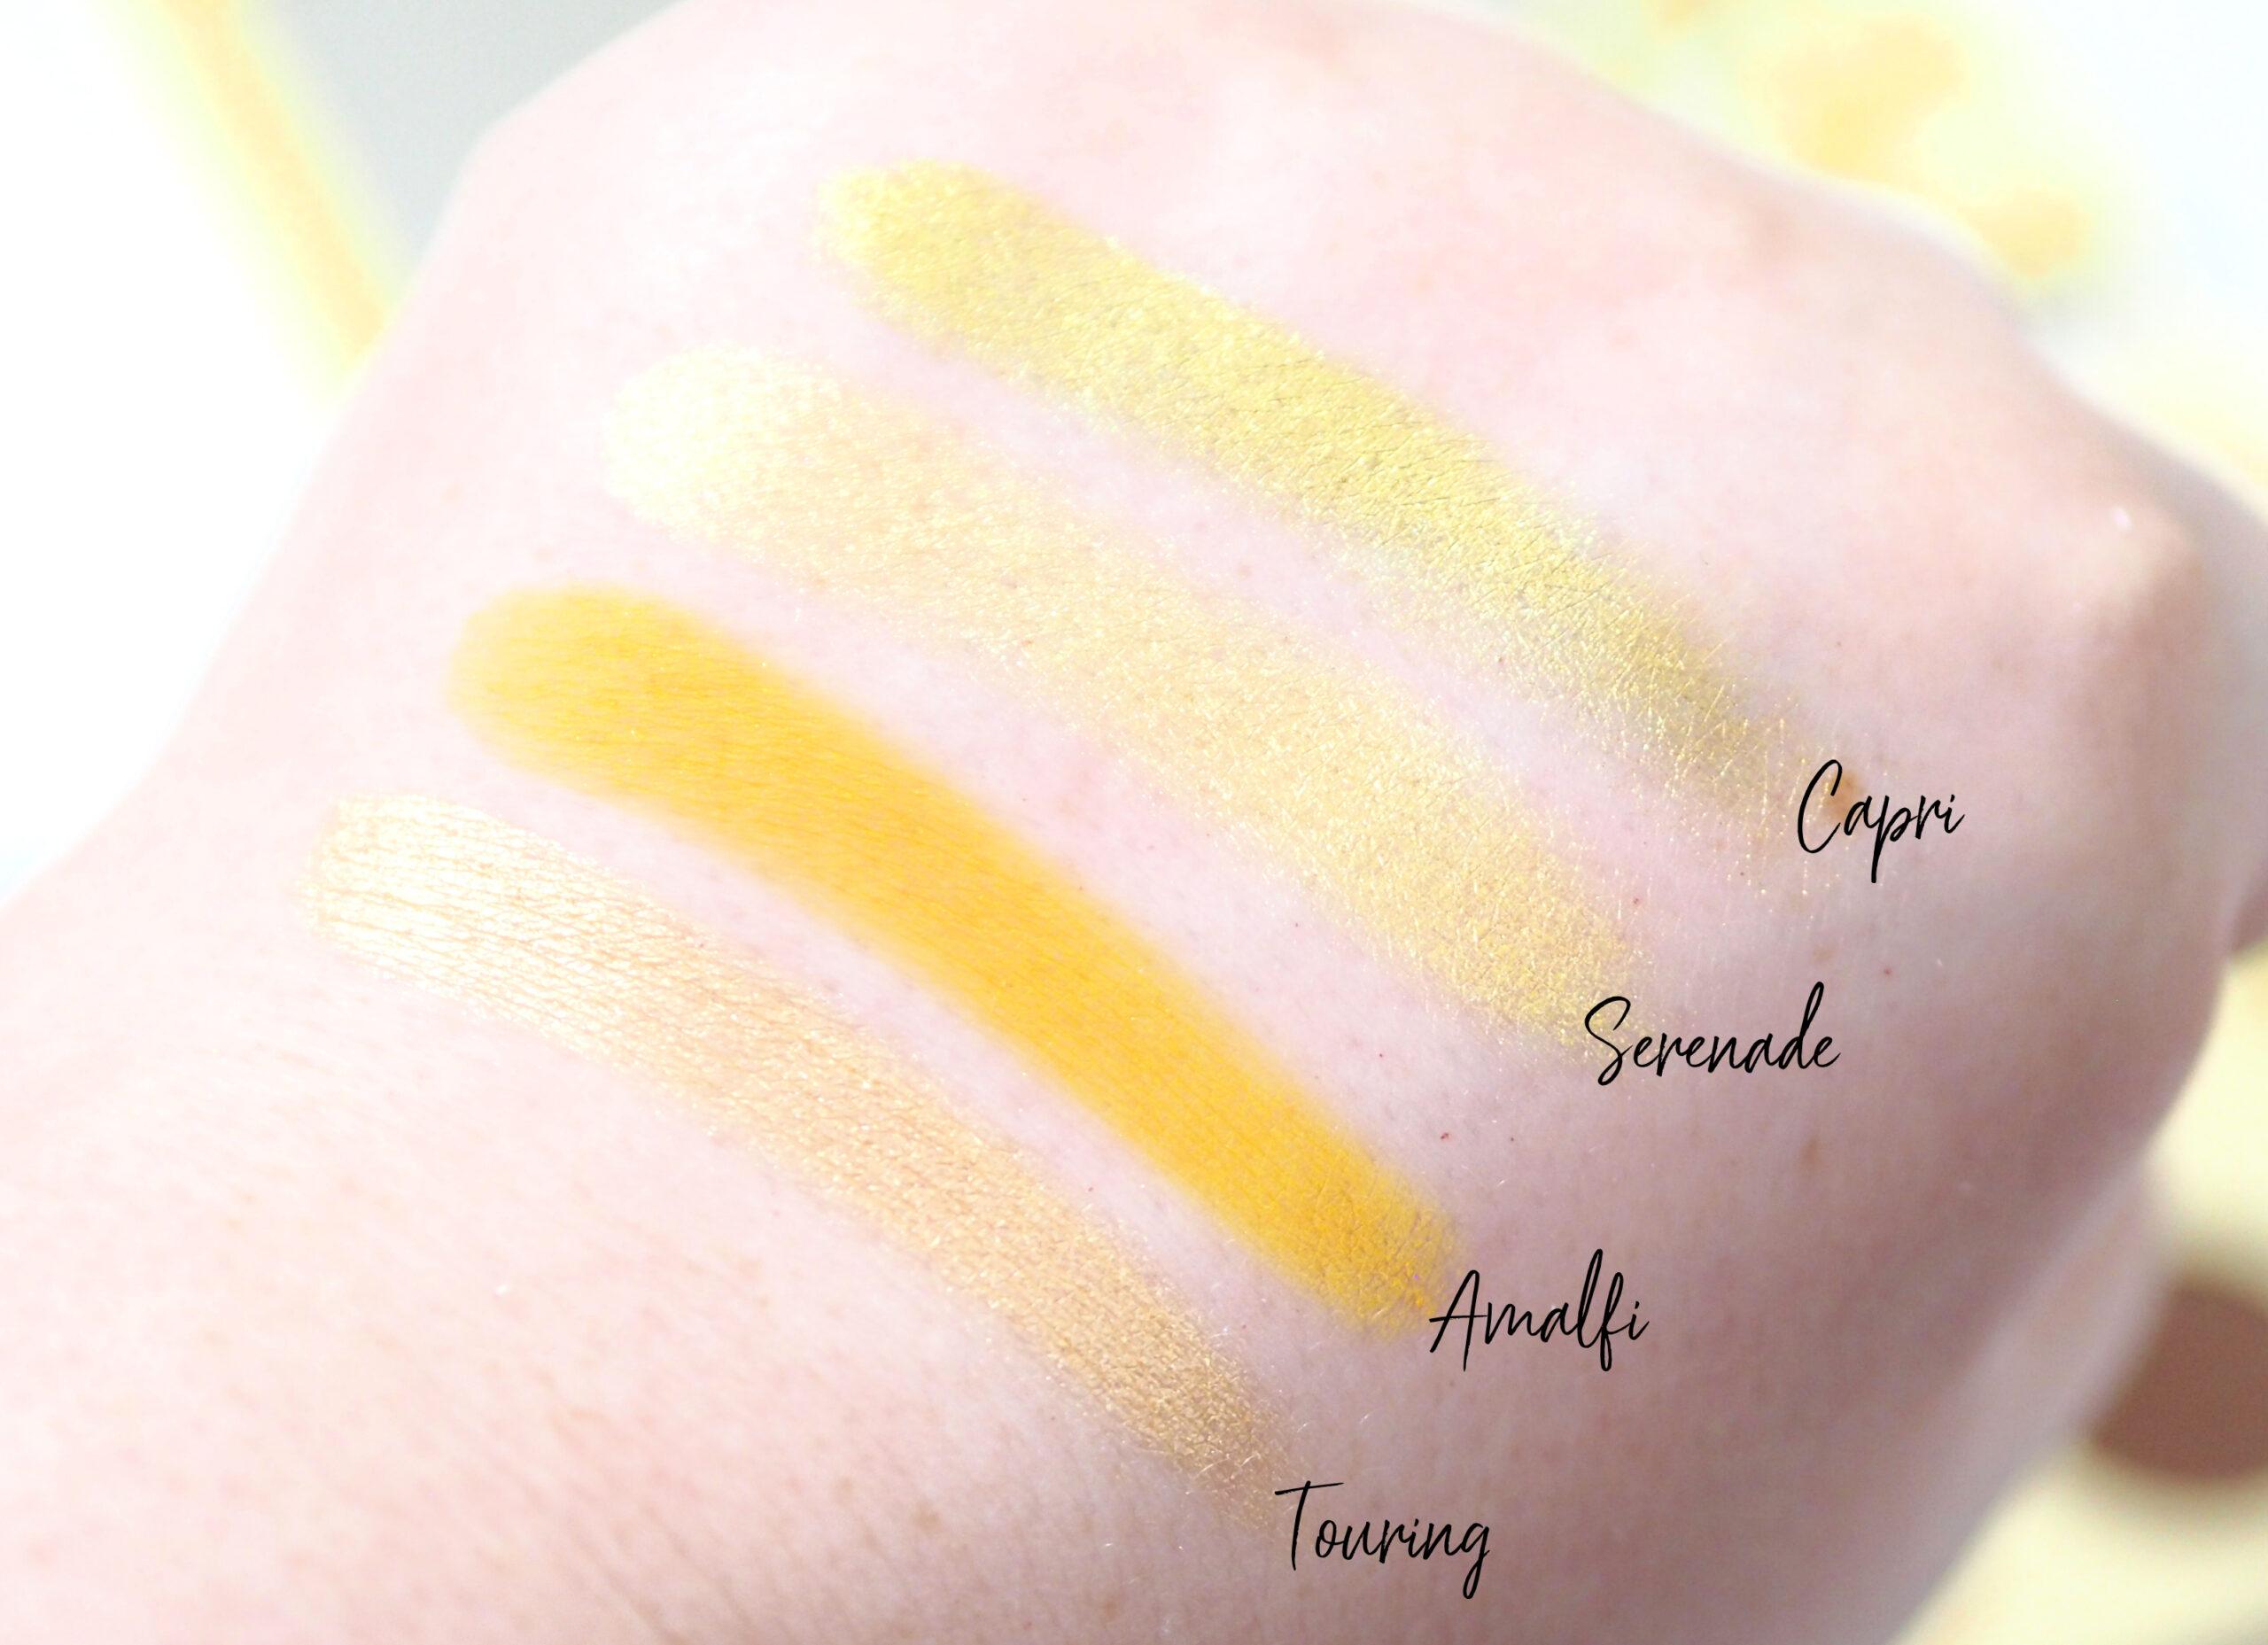 ColourPop Limoncello Eyeshadow Palette Review / Swatches